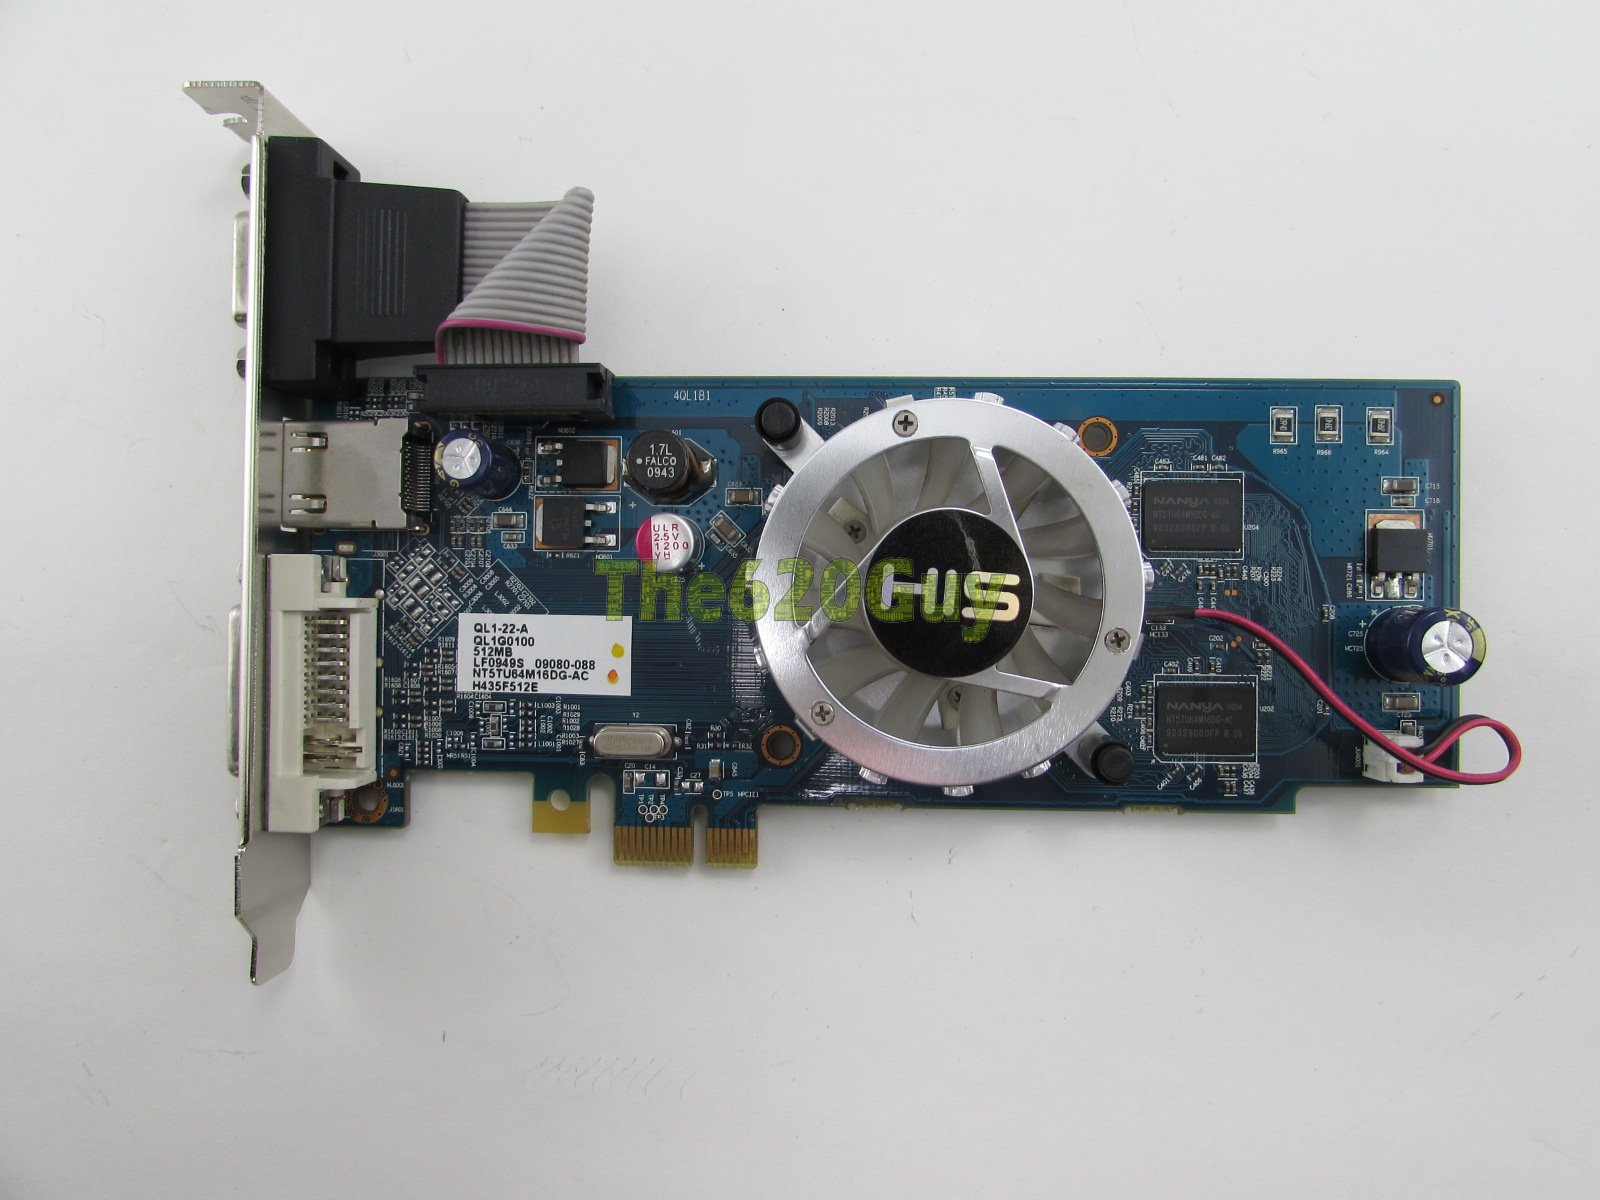 HIS H435F512E ATI Radeon HD 4350 512MB DDR2 VGA/DVI/HDMI PCIe x1 Video Card  GPU - The620Guy com